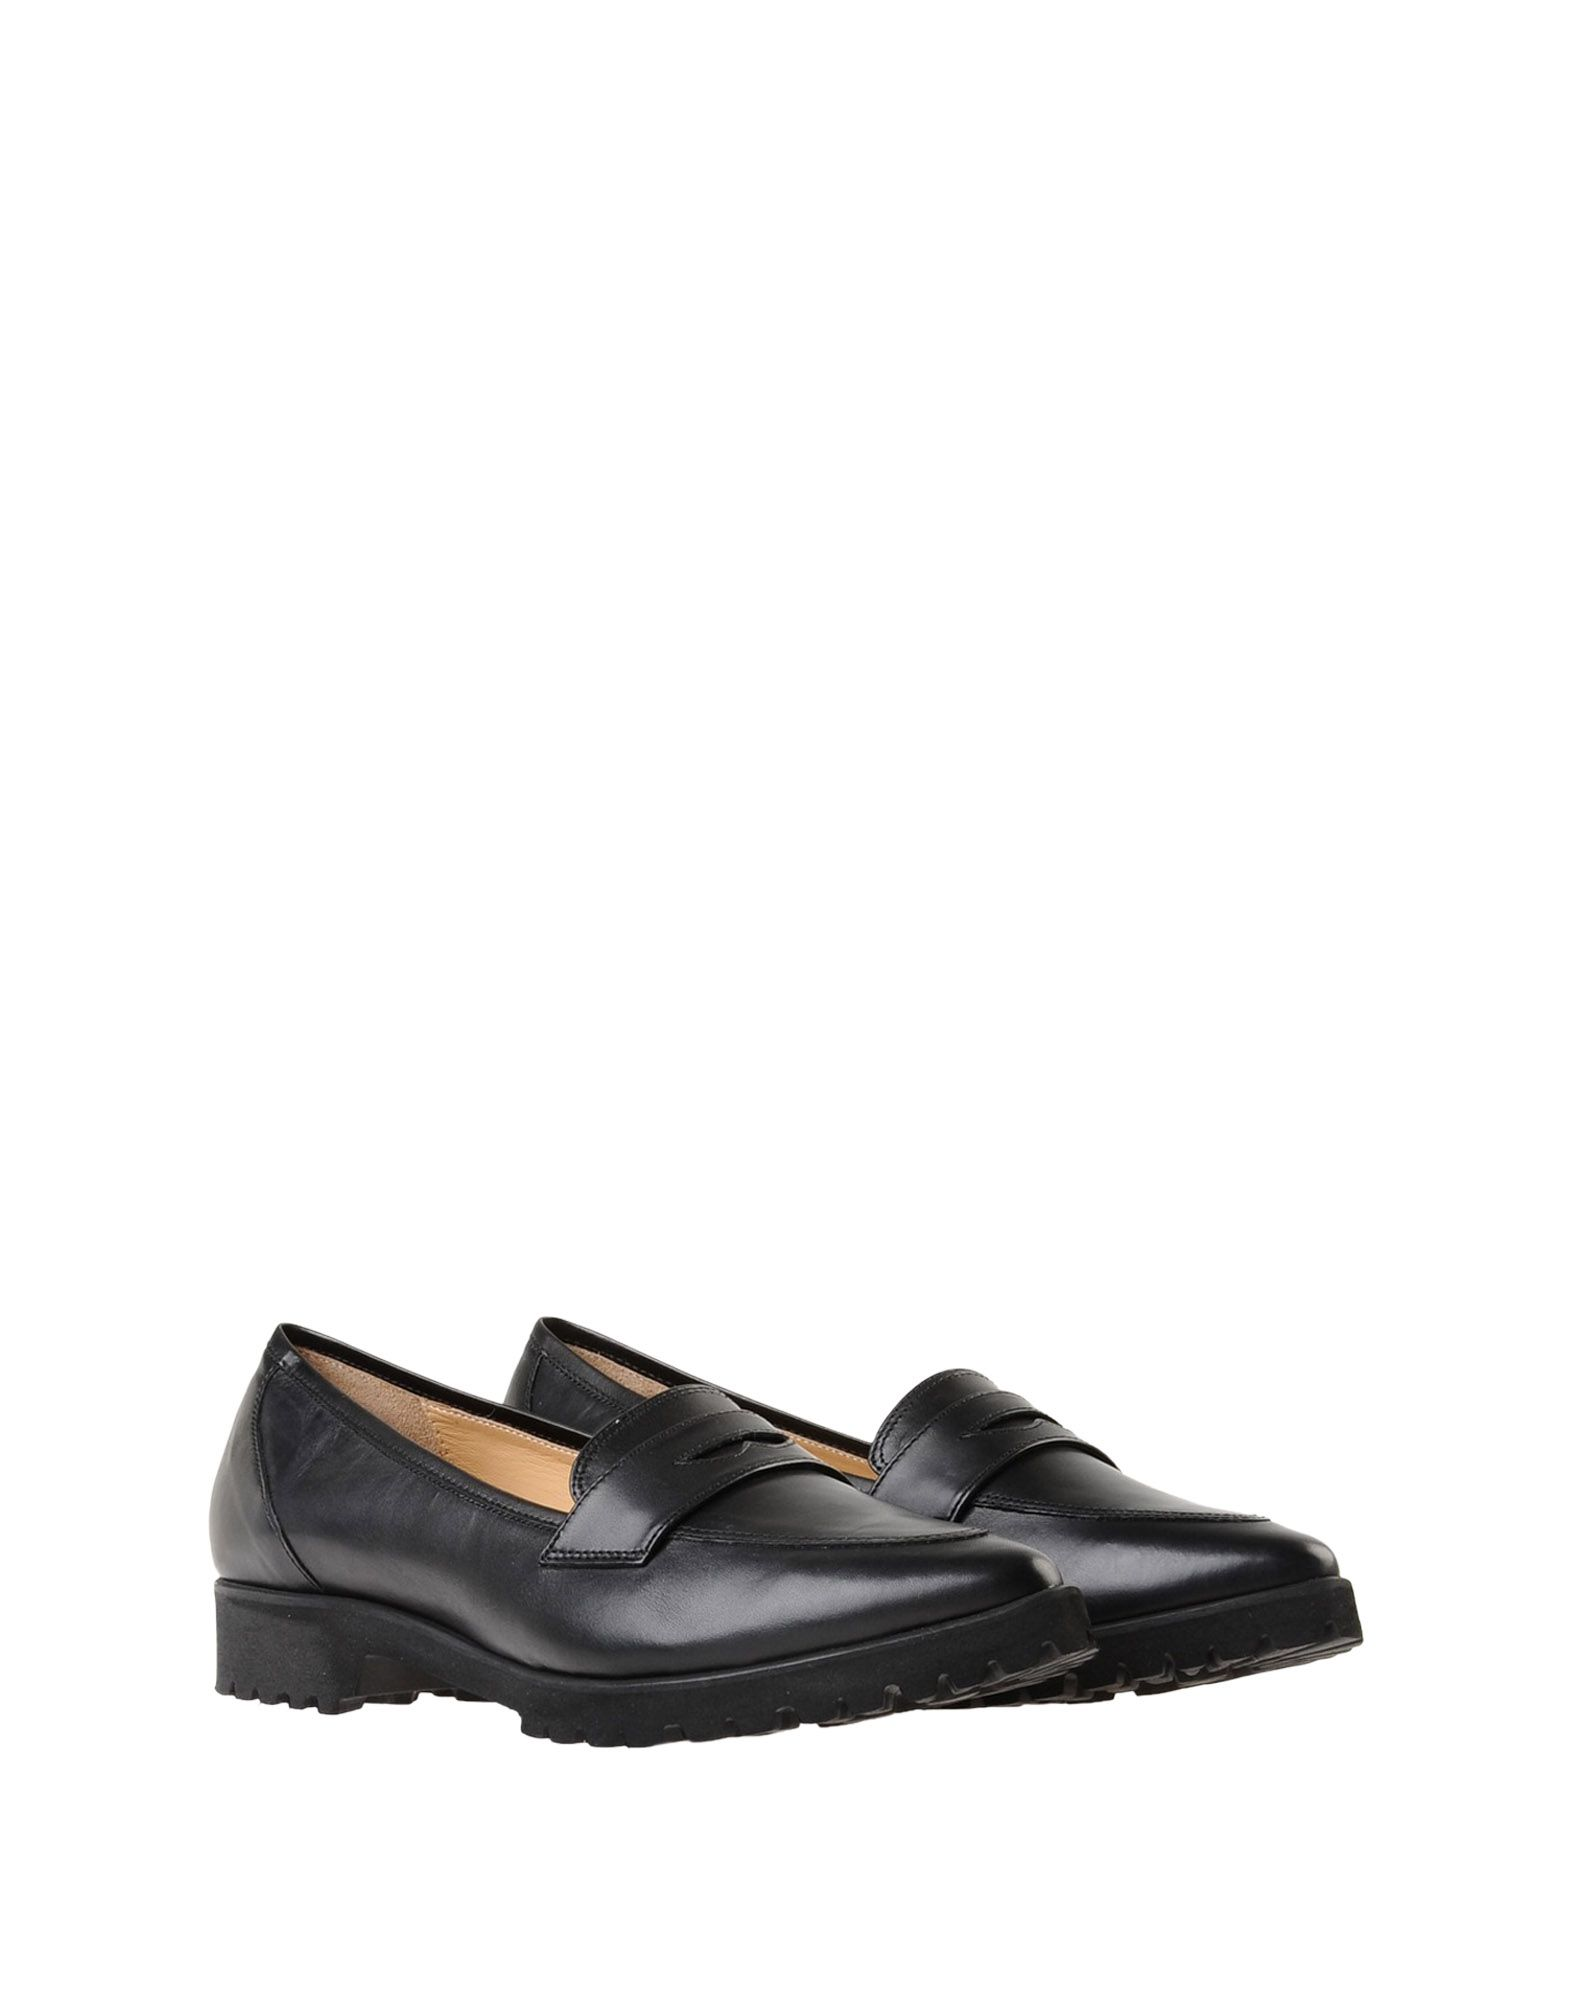 Stilvolle billige Schuhe Leonardo Principi Mokassins 11540216DP Damen  11540216DP Mokassins 4d8bf9